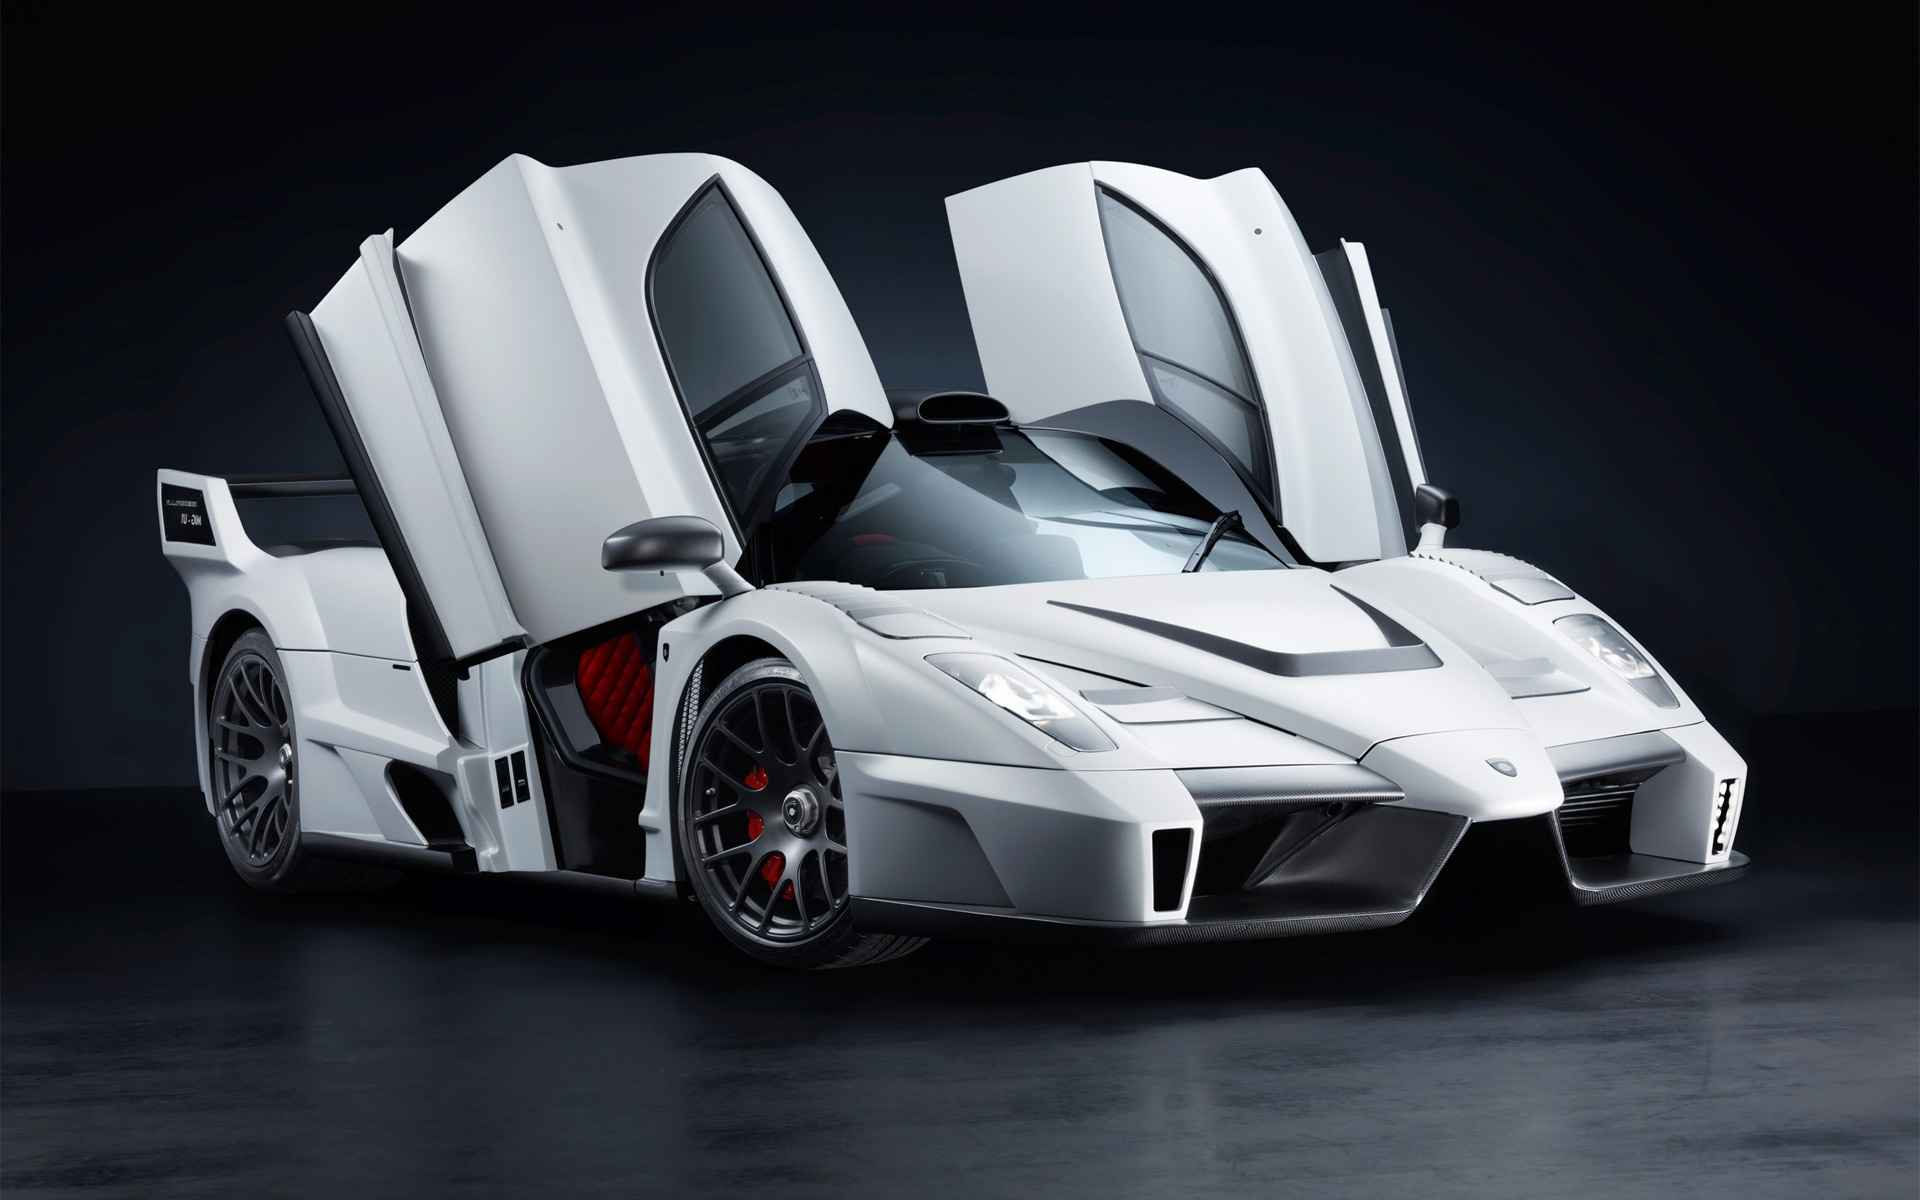 Ferrari-Mig-Enzo-Gemballa-Wallpapers-Free-Download